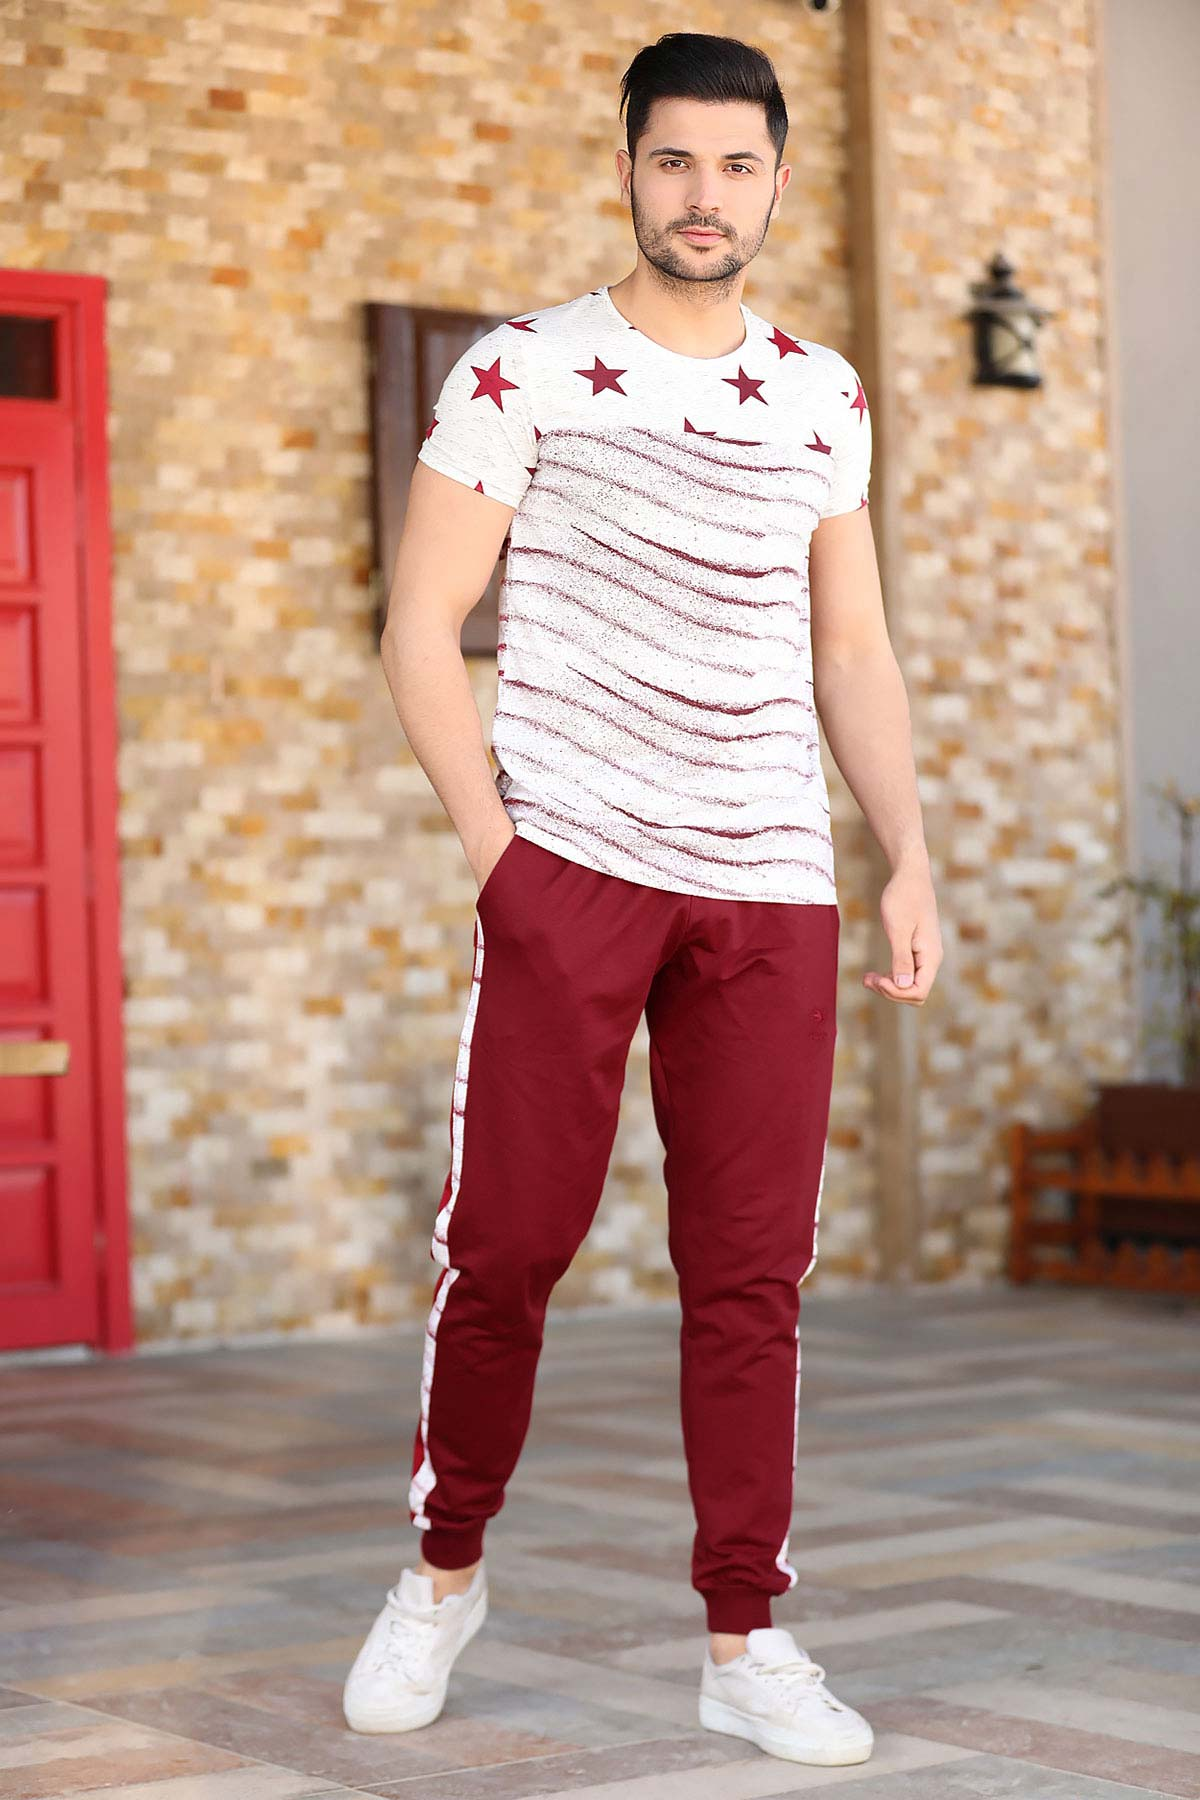 Men's Printed T-shirt Claret Red Pants Training Suit